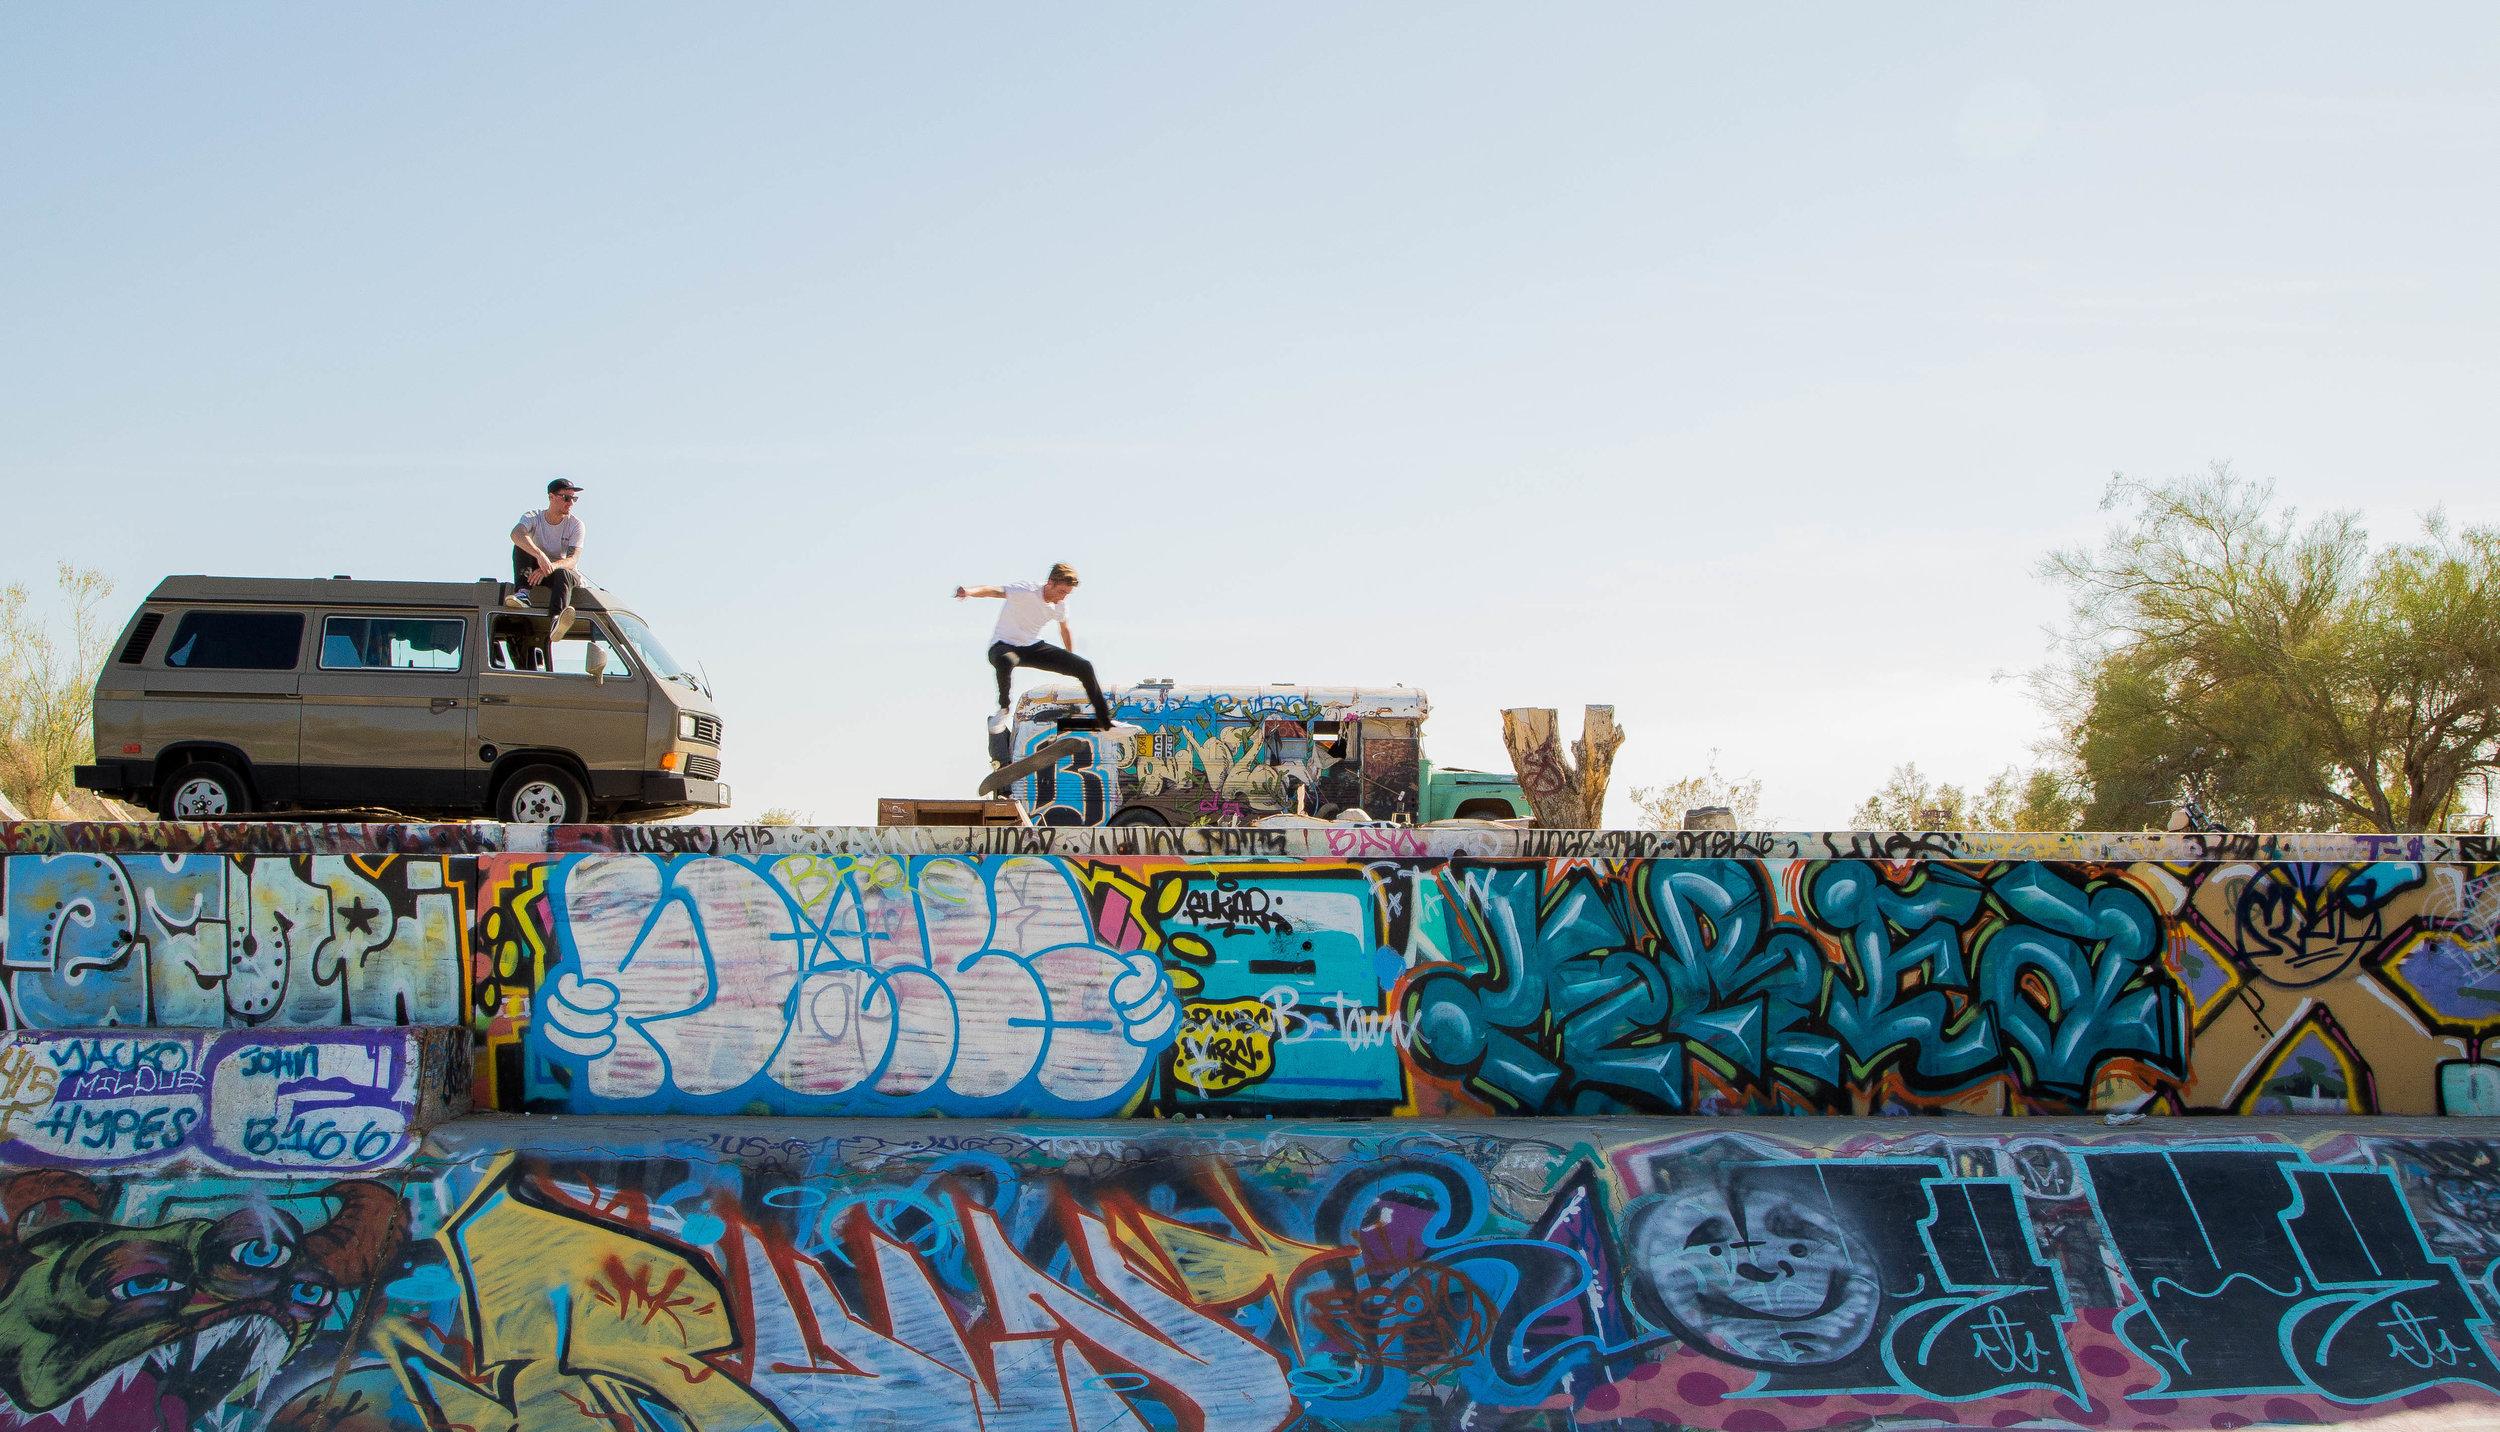 Kickflipin' in Slab City, California, Photo: Rachel Heisel